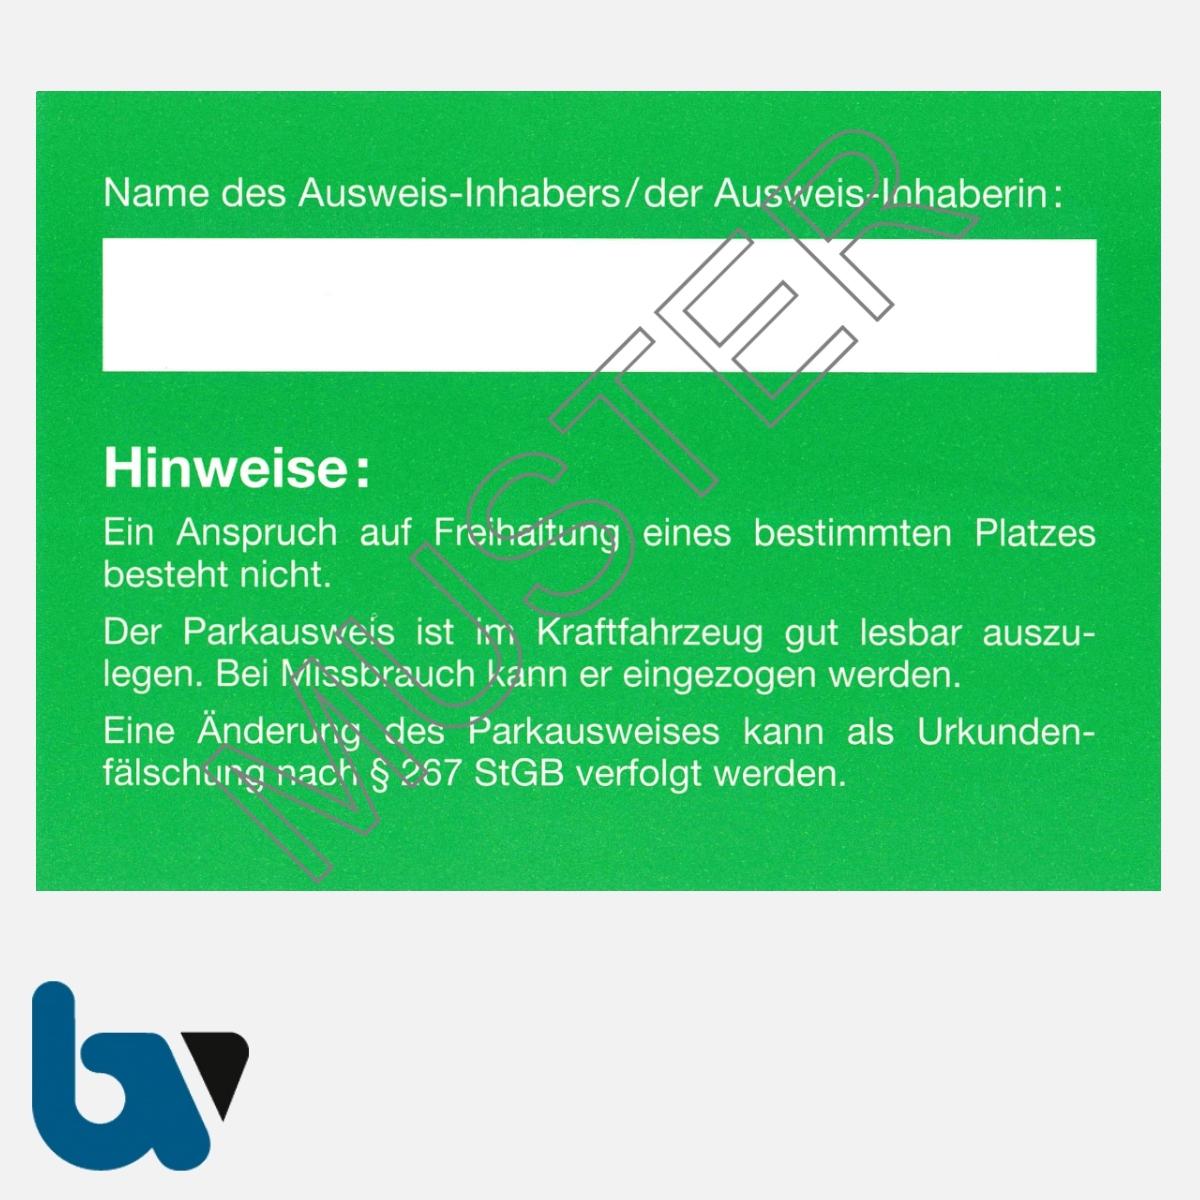 0/497-8 Bewohnerparkausweis amtlich Muster grün DIN A6 Karton RS | Borgard Verlag GmbH